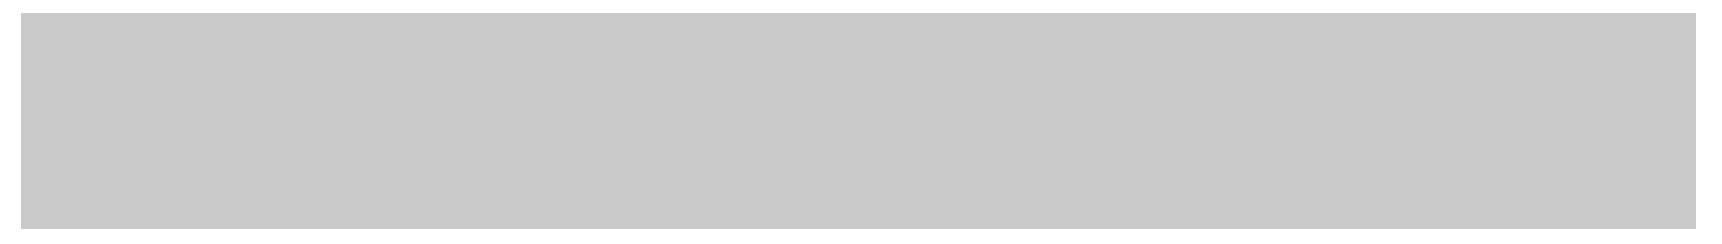 logo-mimecast (1)_Grey